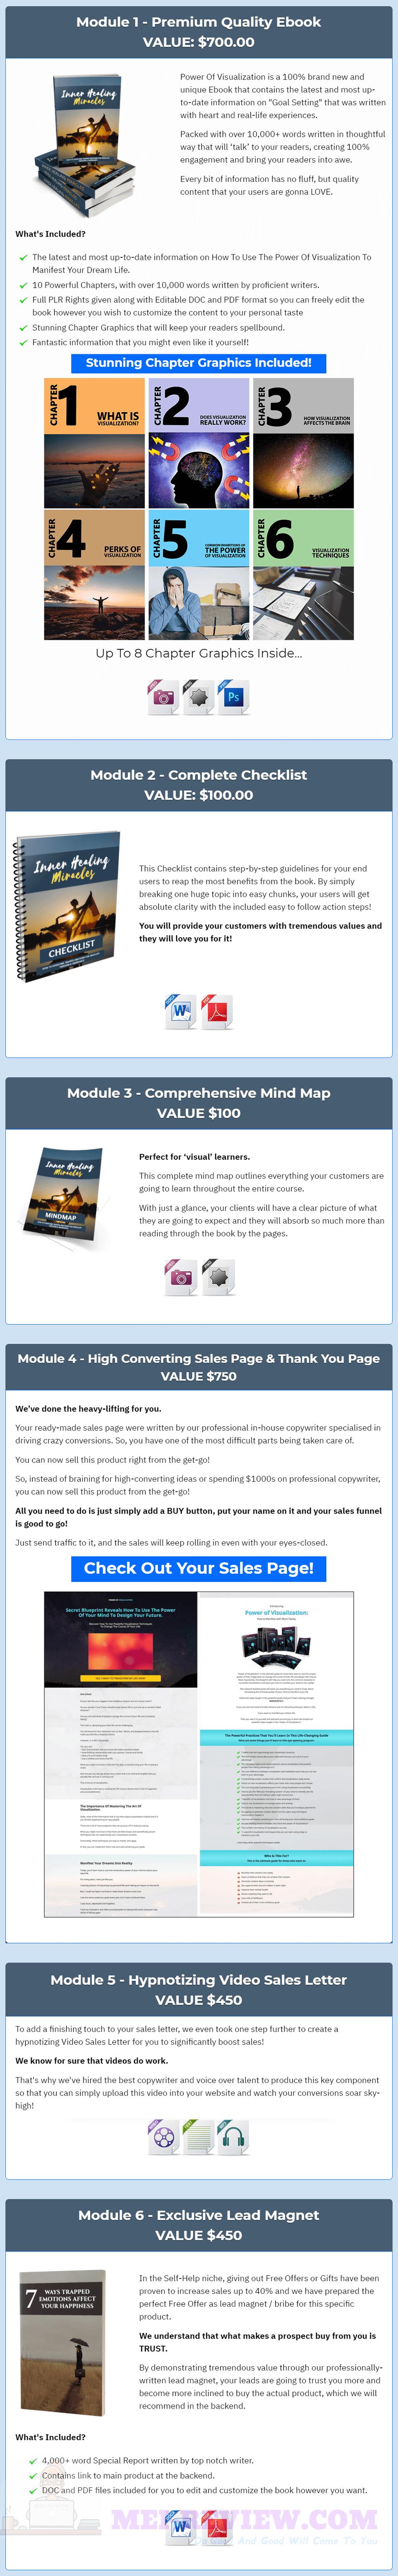 PLR-Inner-Healing-Miracles-feature-1-module